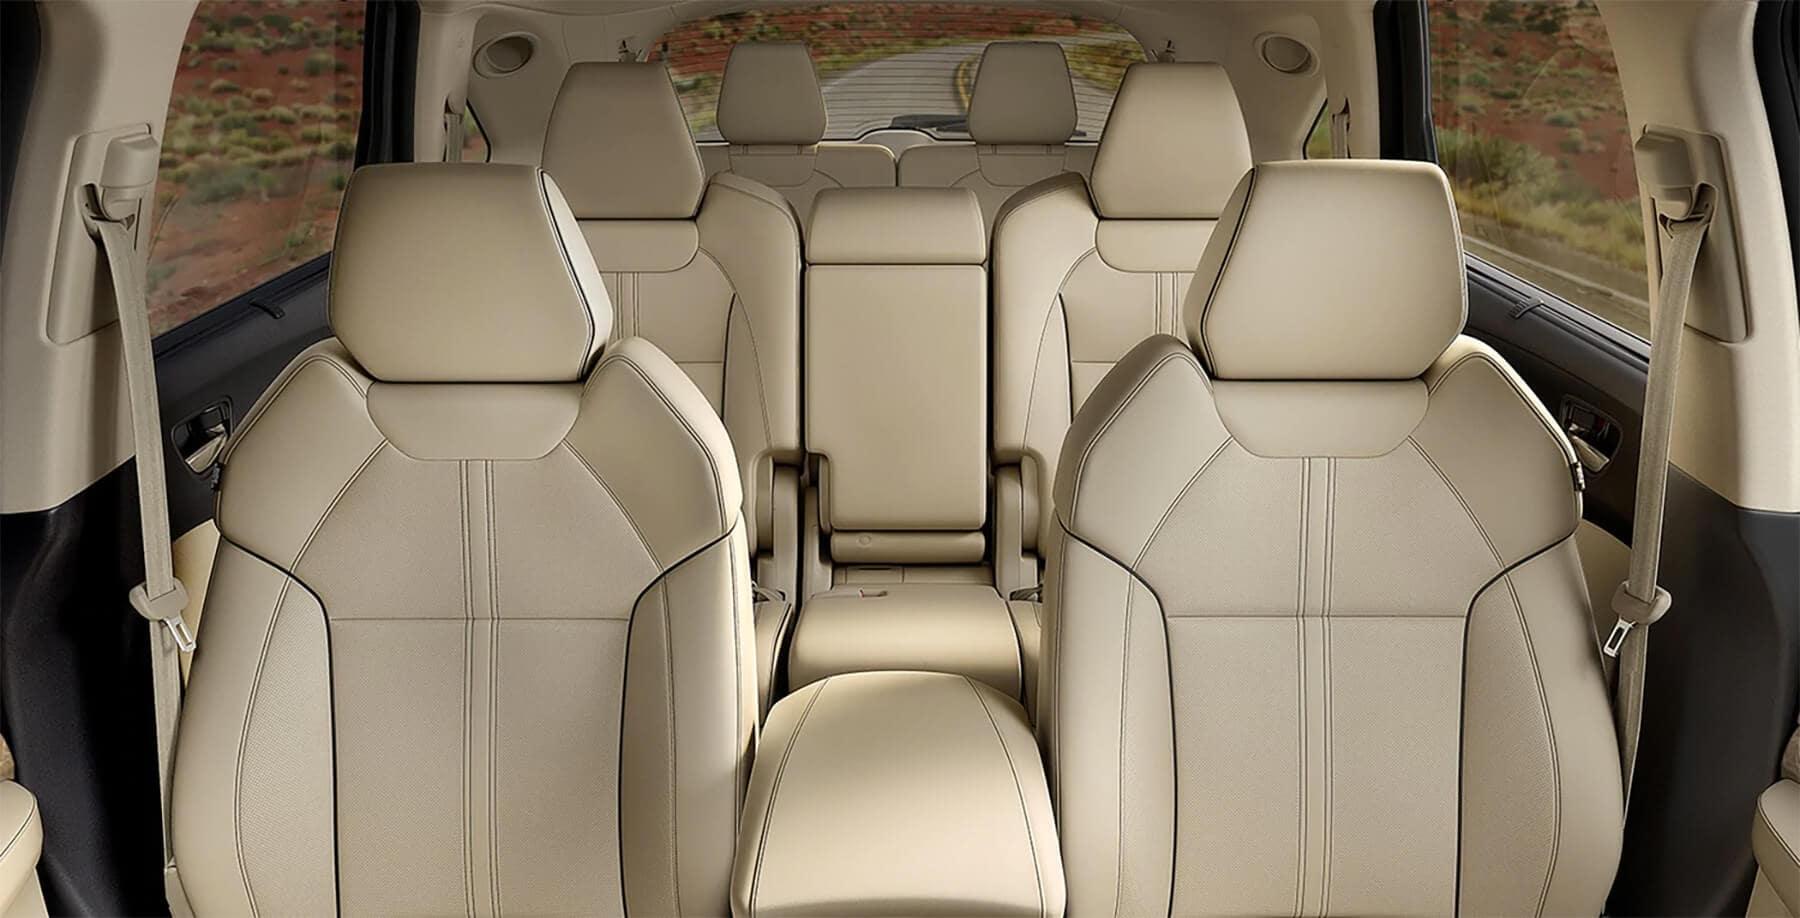 2020 Acura MDX Interior Dimensions Slider